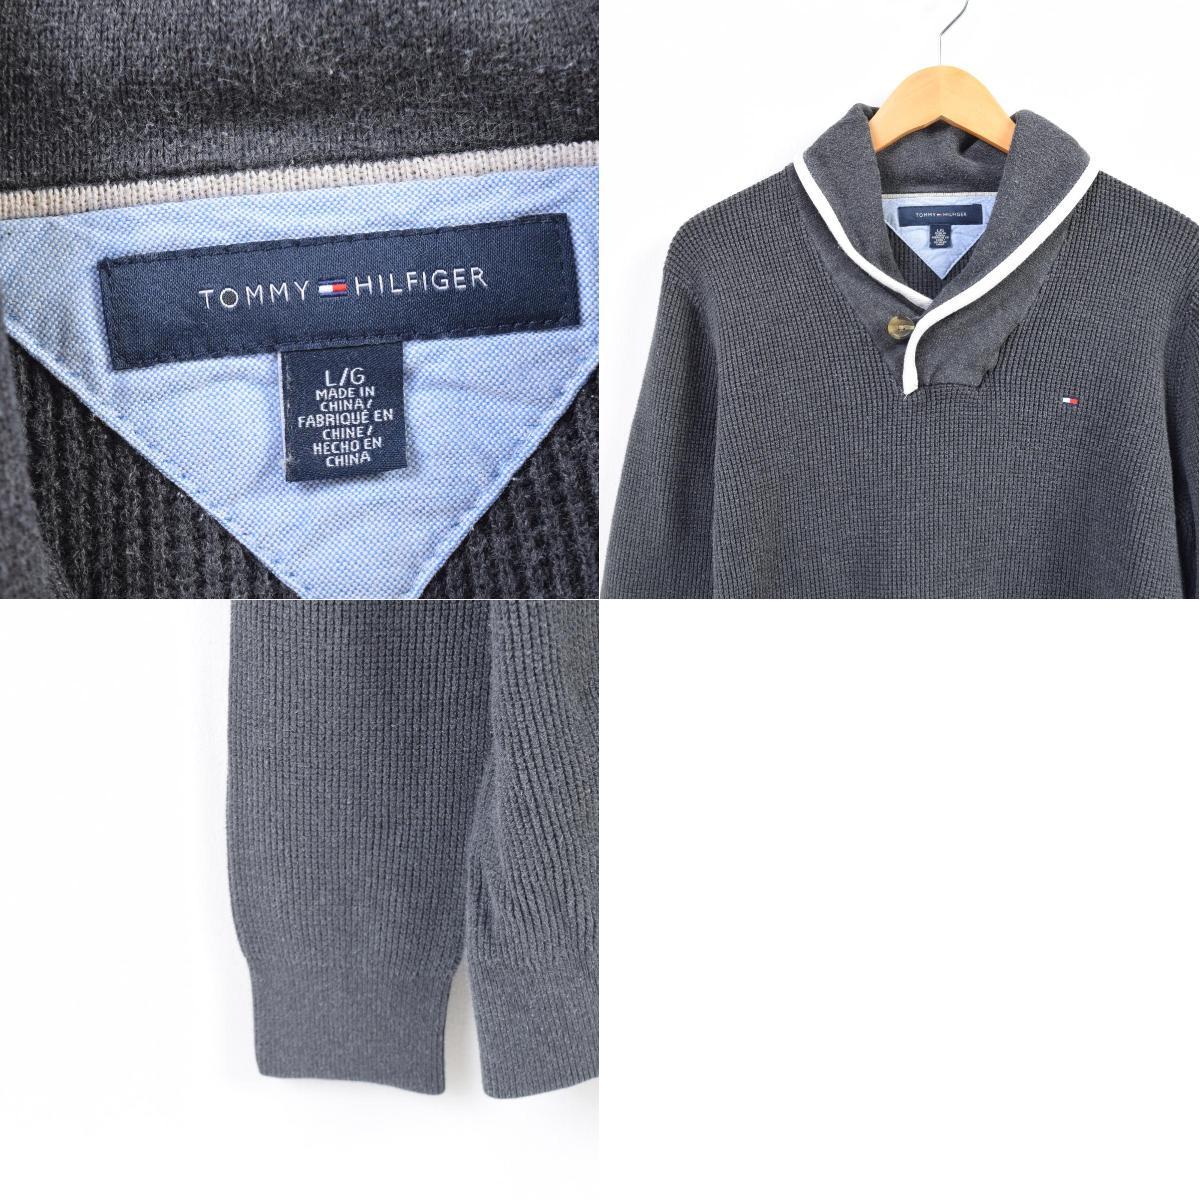 07633a63fcc39 It is waffle place cotton knit sweater men S  wav8547 トミーヒルフィガー TOMMY  HILFIGER shawl Kalla